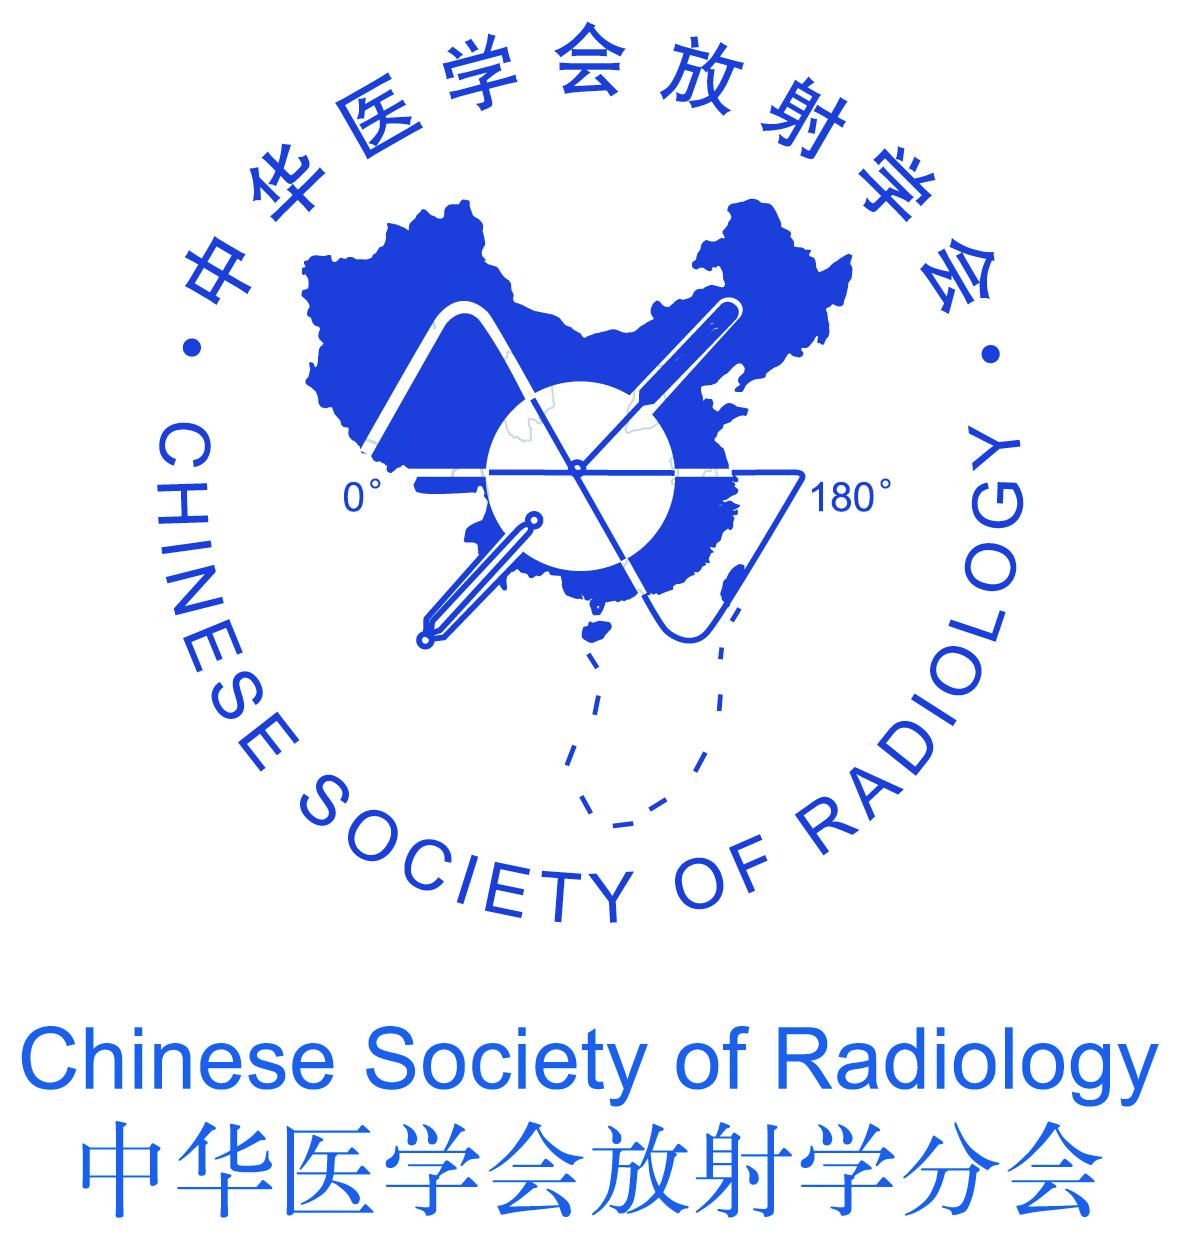 Chinese Society of Radiology